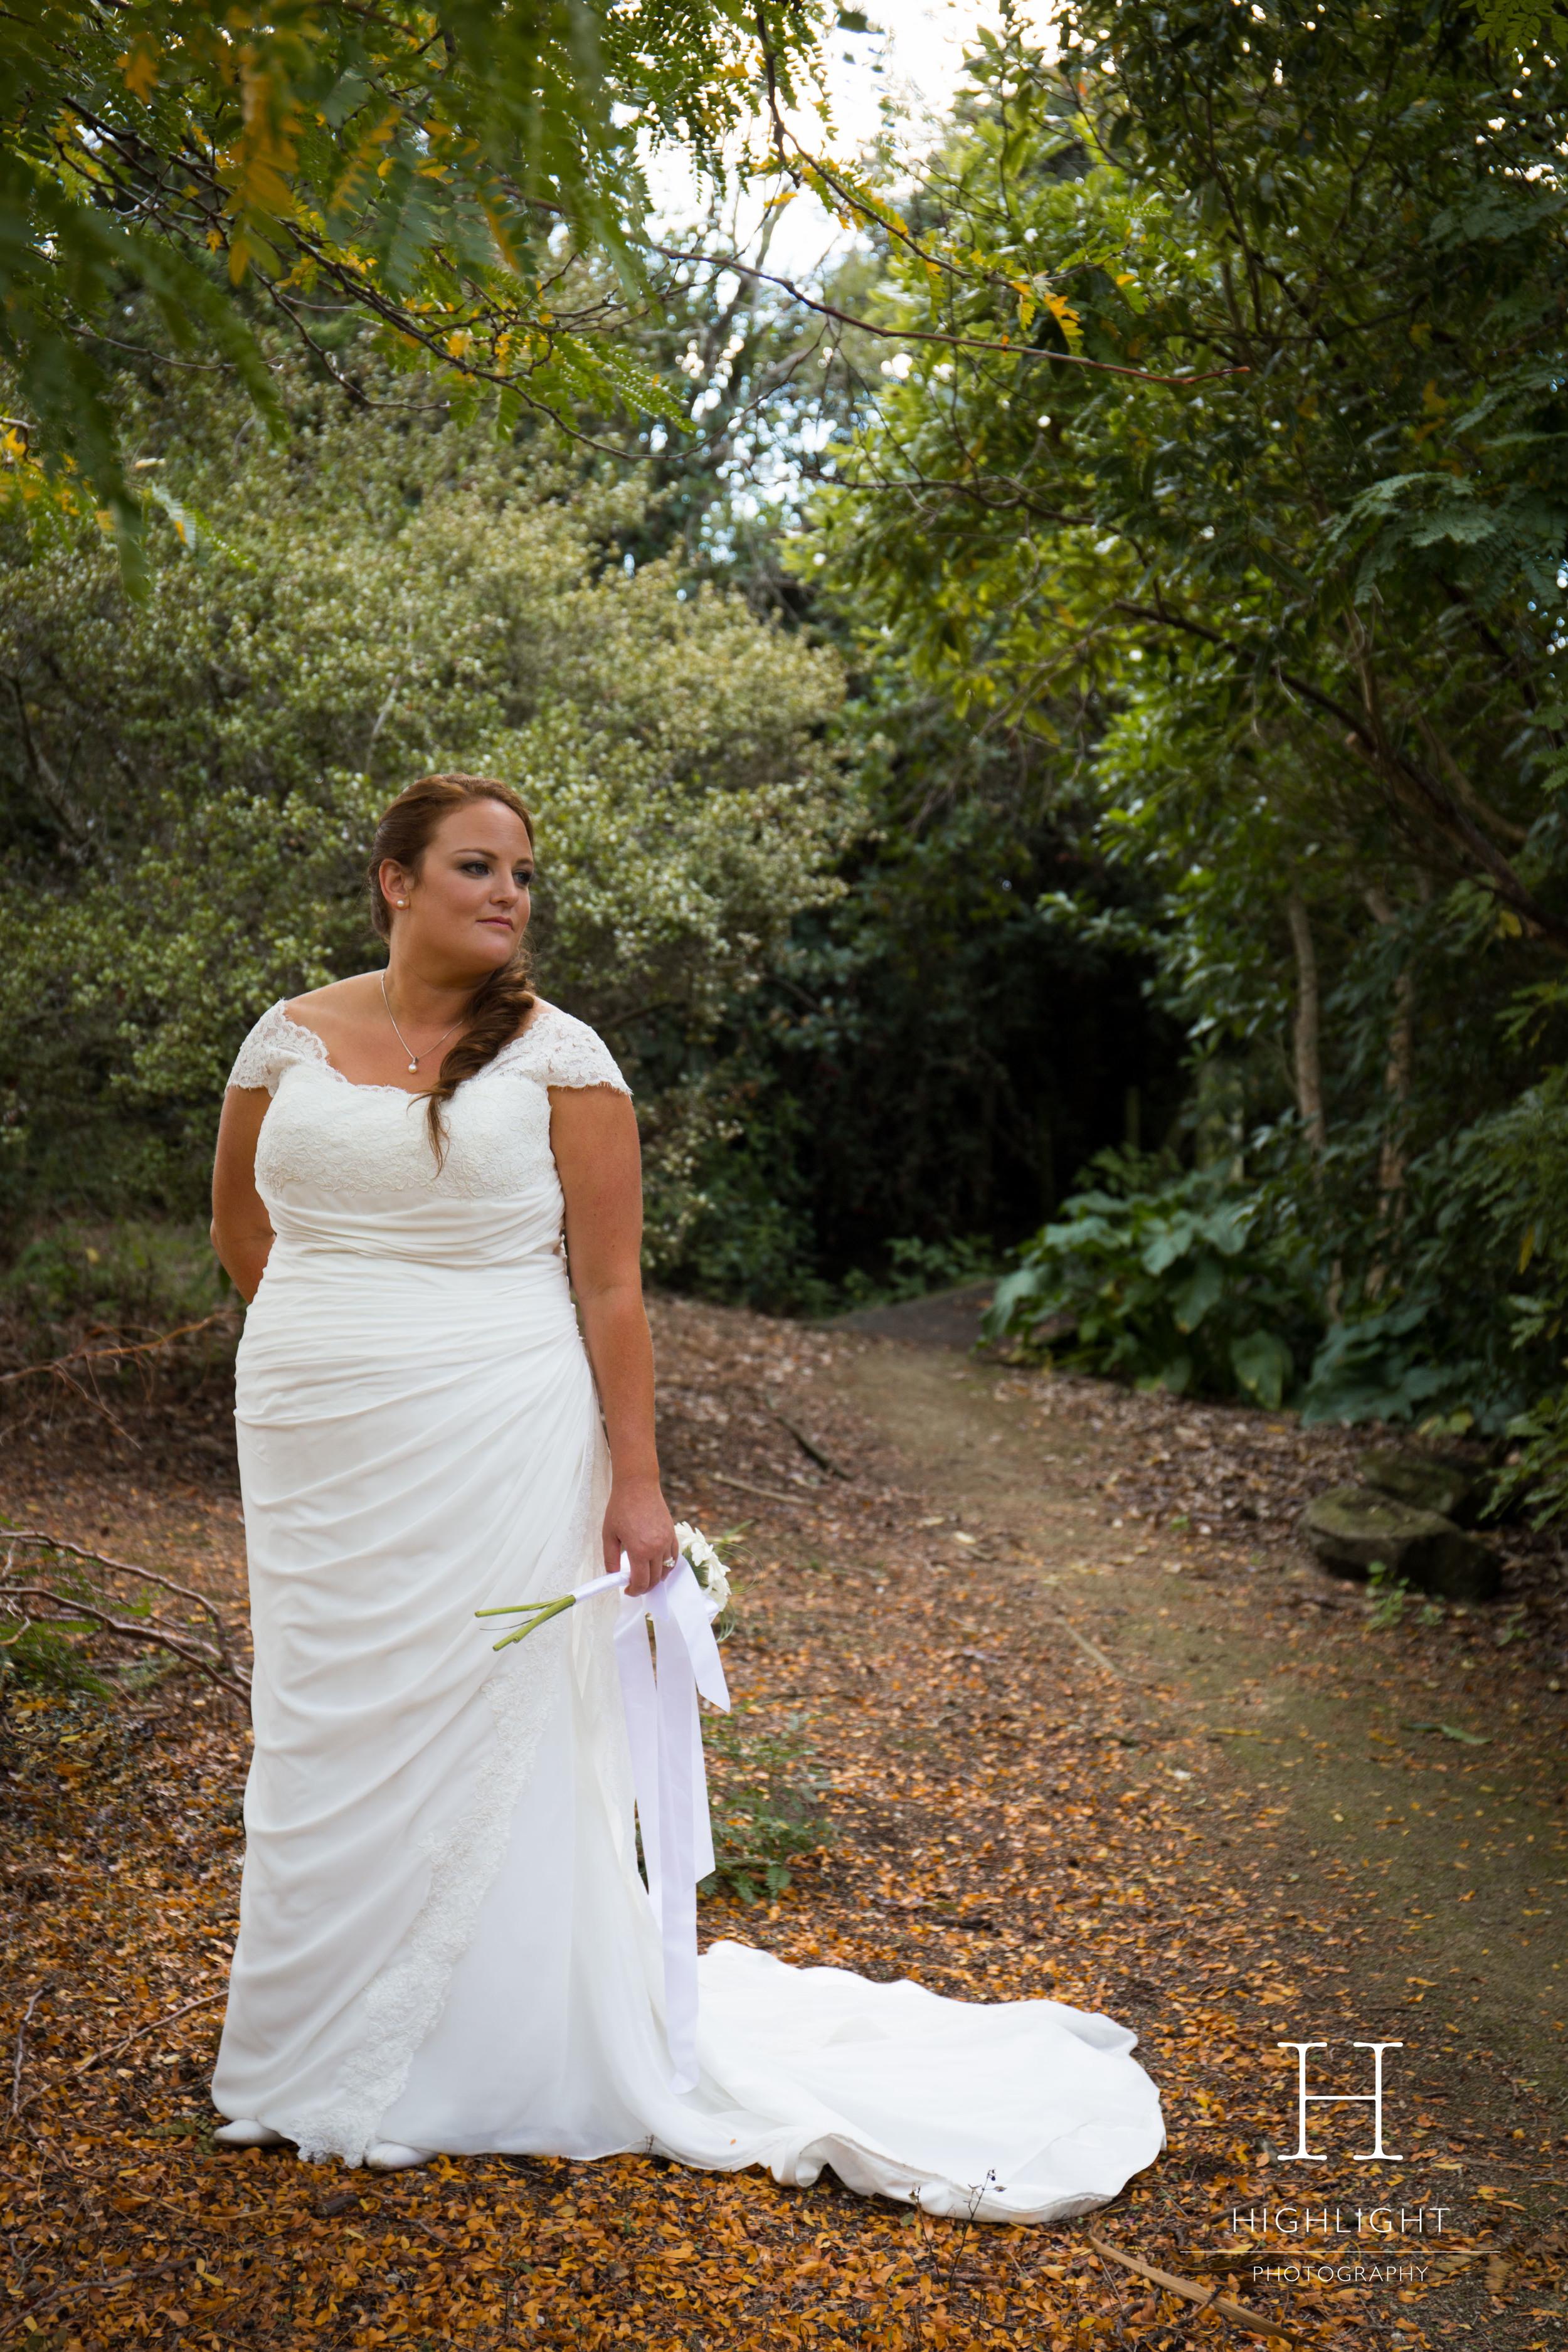 highlight_wedding_photography_palmerston-north_forest-bride_masterton_new_zealand.jpg